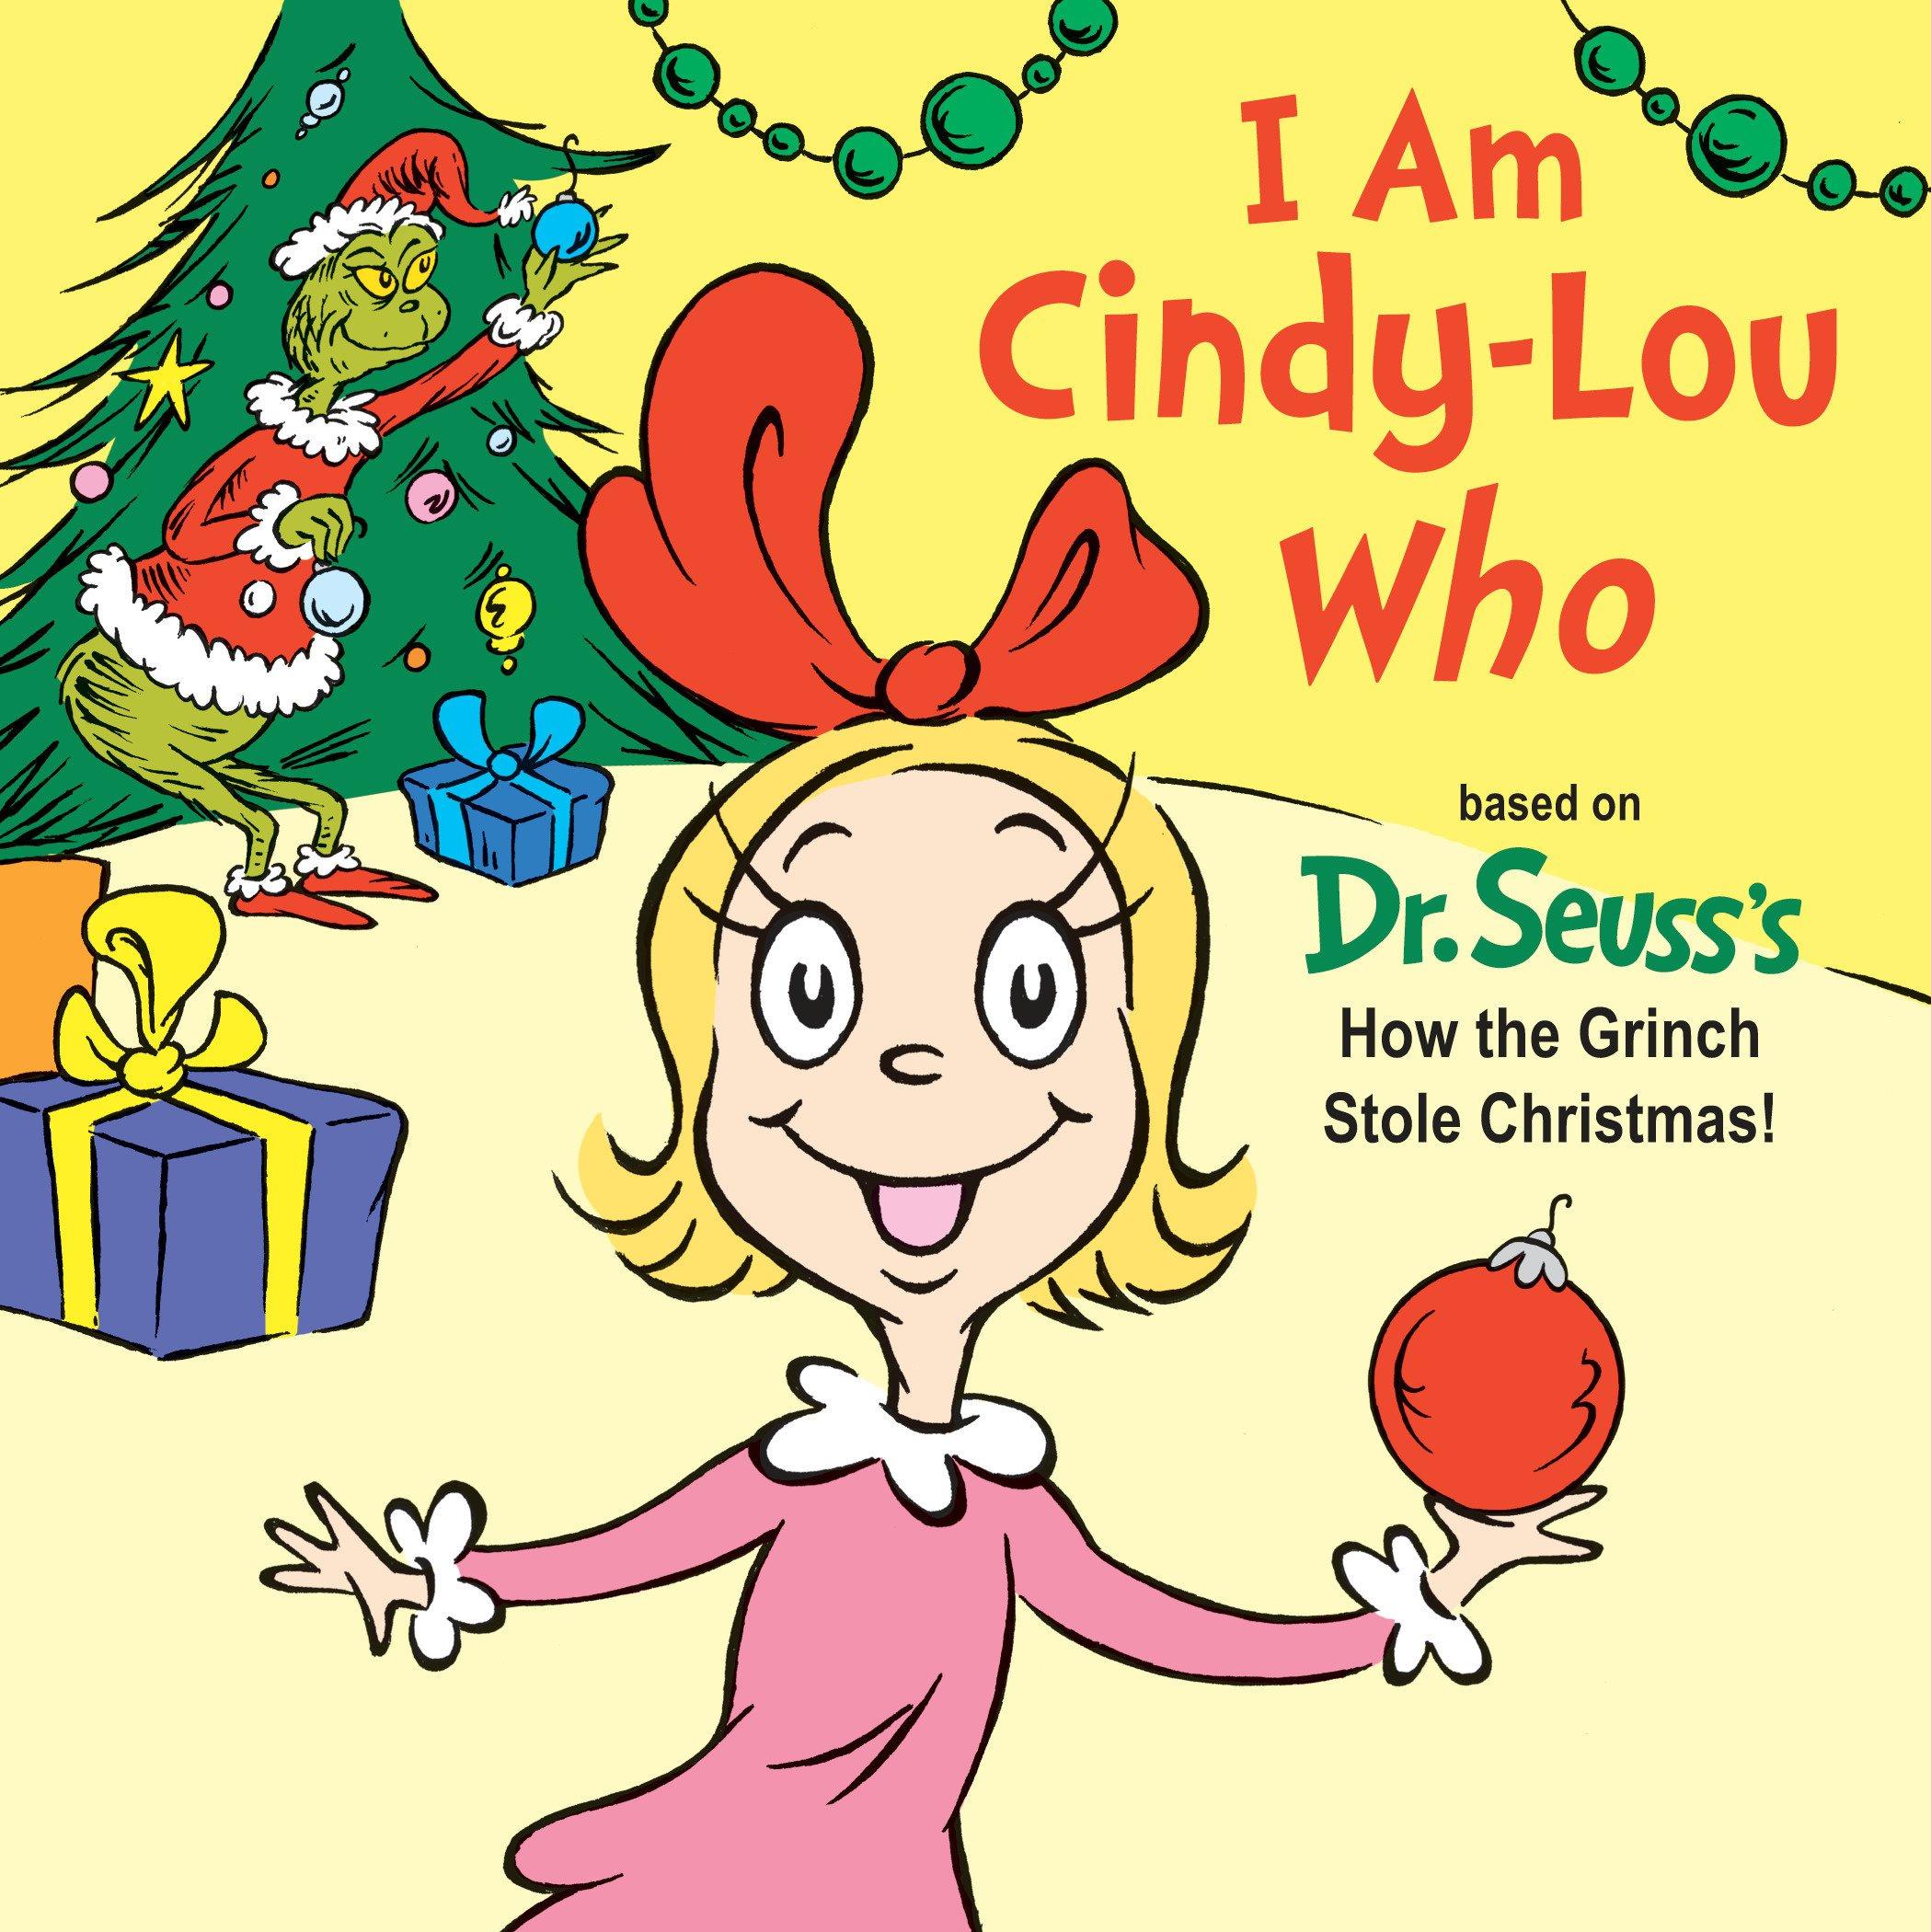 Dr Seuss The Grinch Who Stole Christmas Poem.Amazon Com I Am Cindy Lou Who 9781524718039 Tish Rabe Books